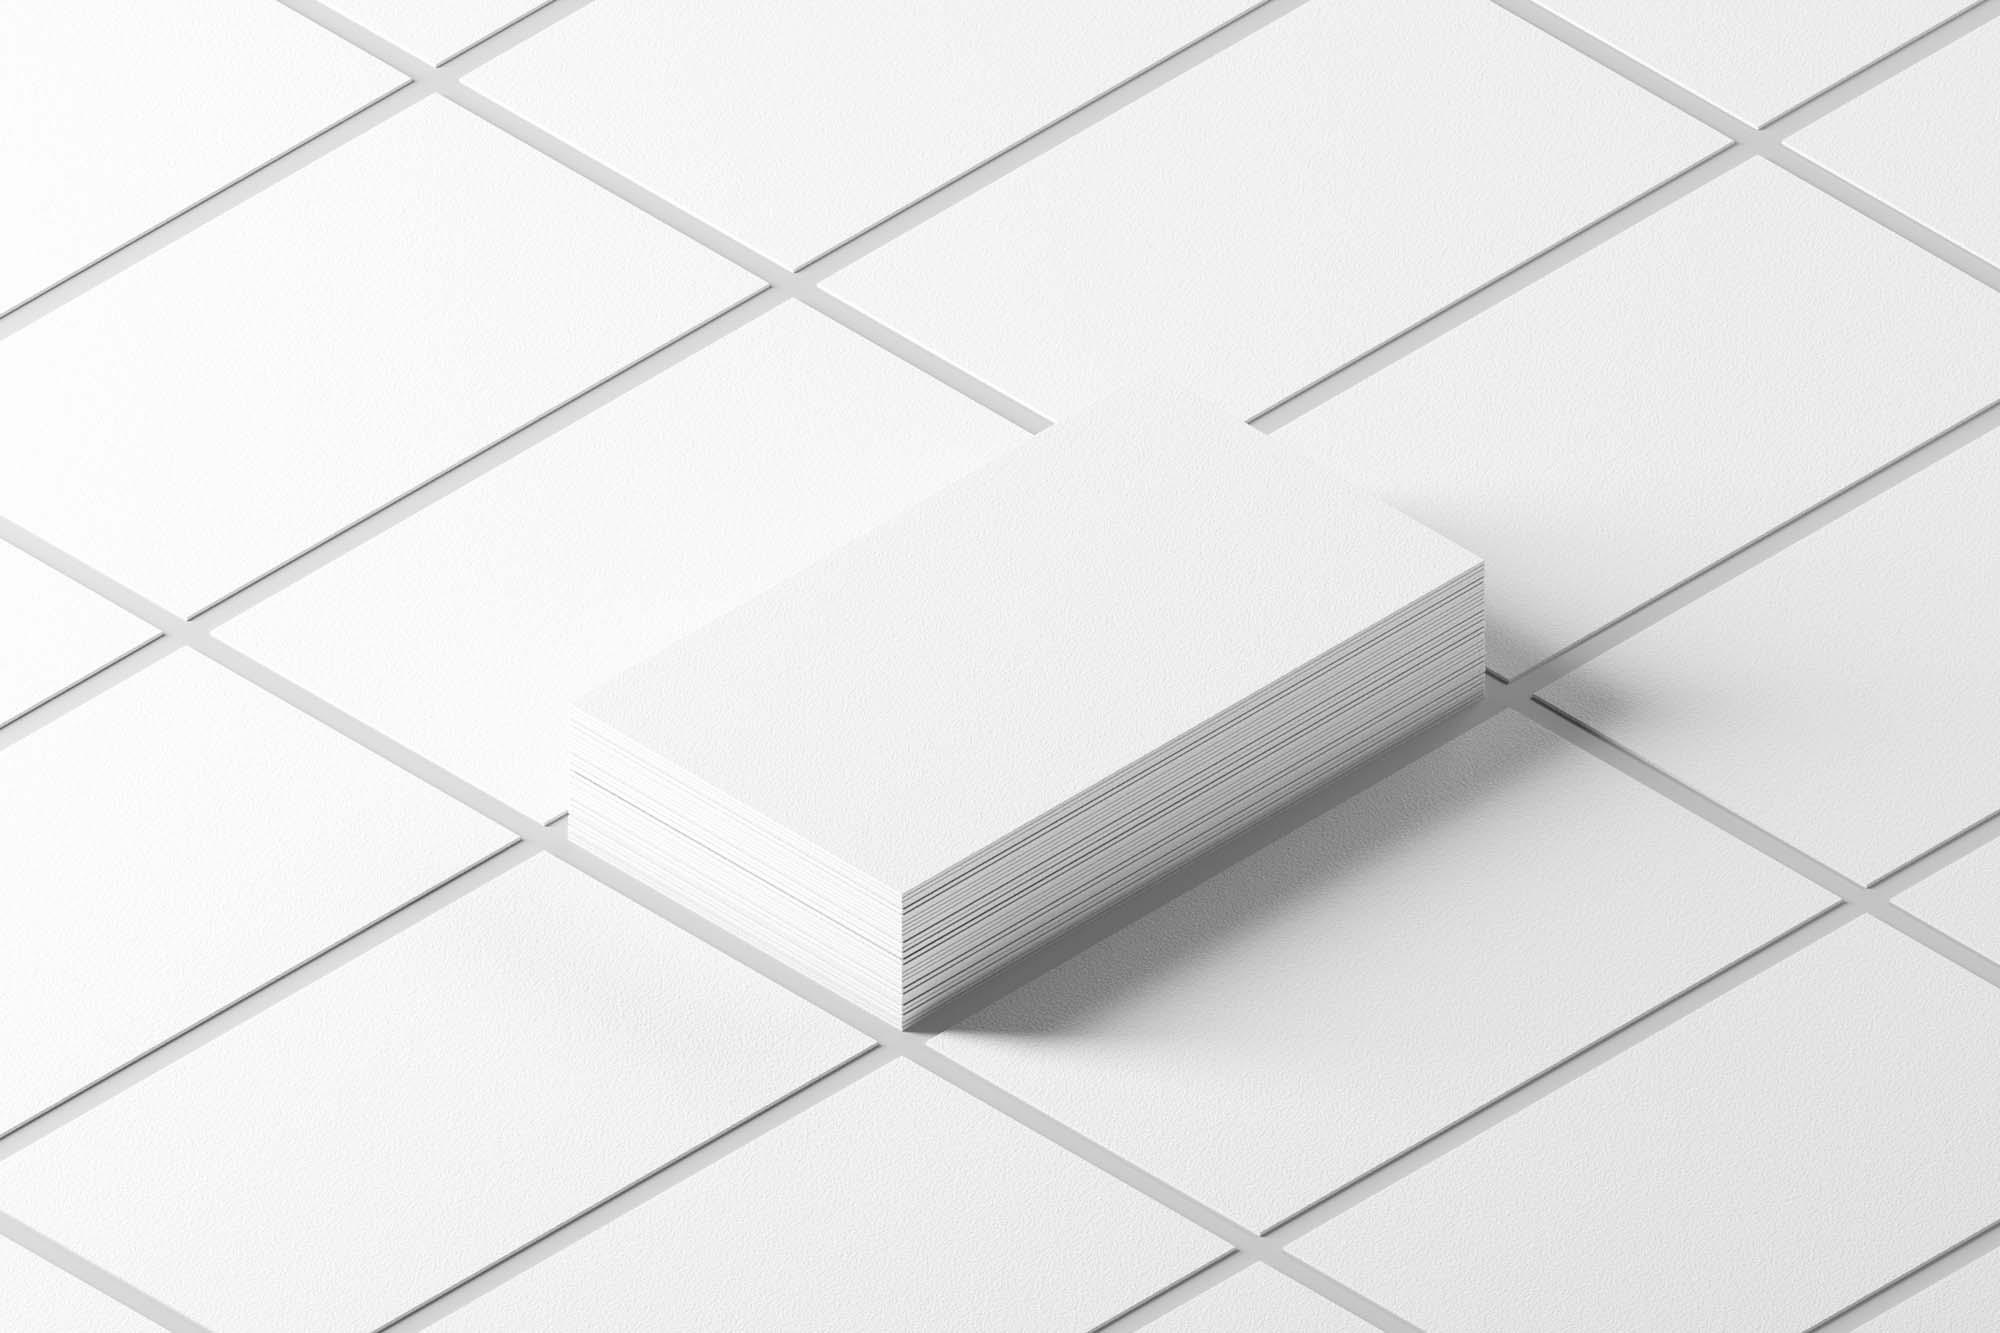 White Isometric Business Cards Mockup 2